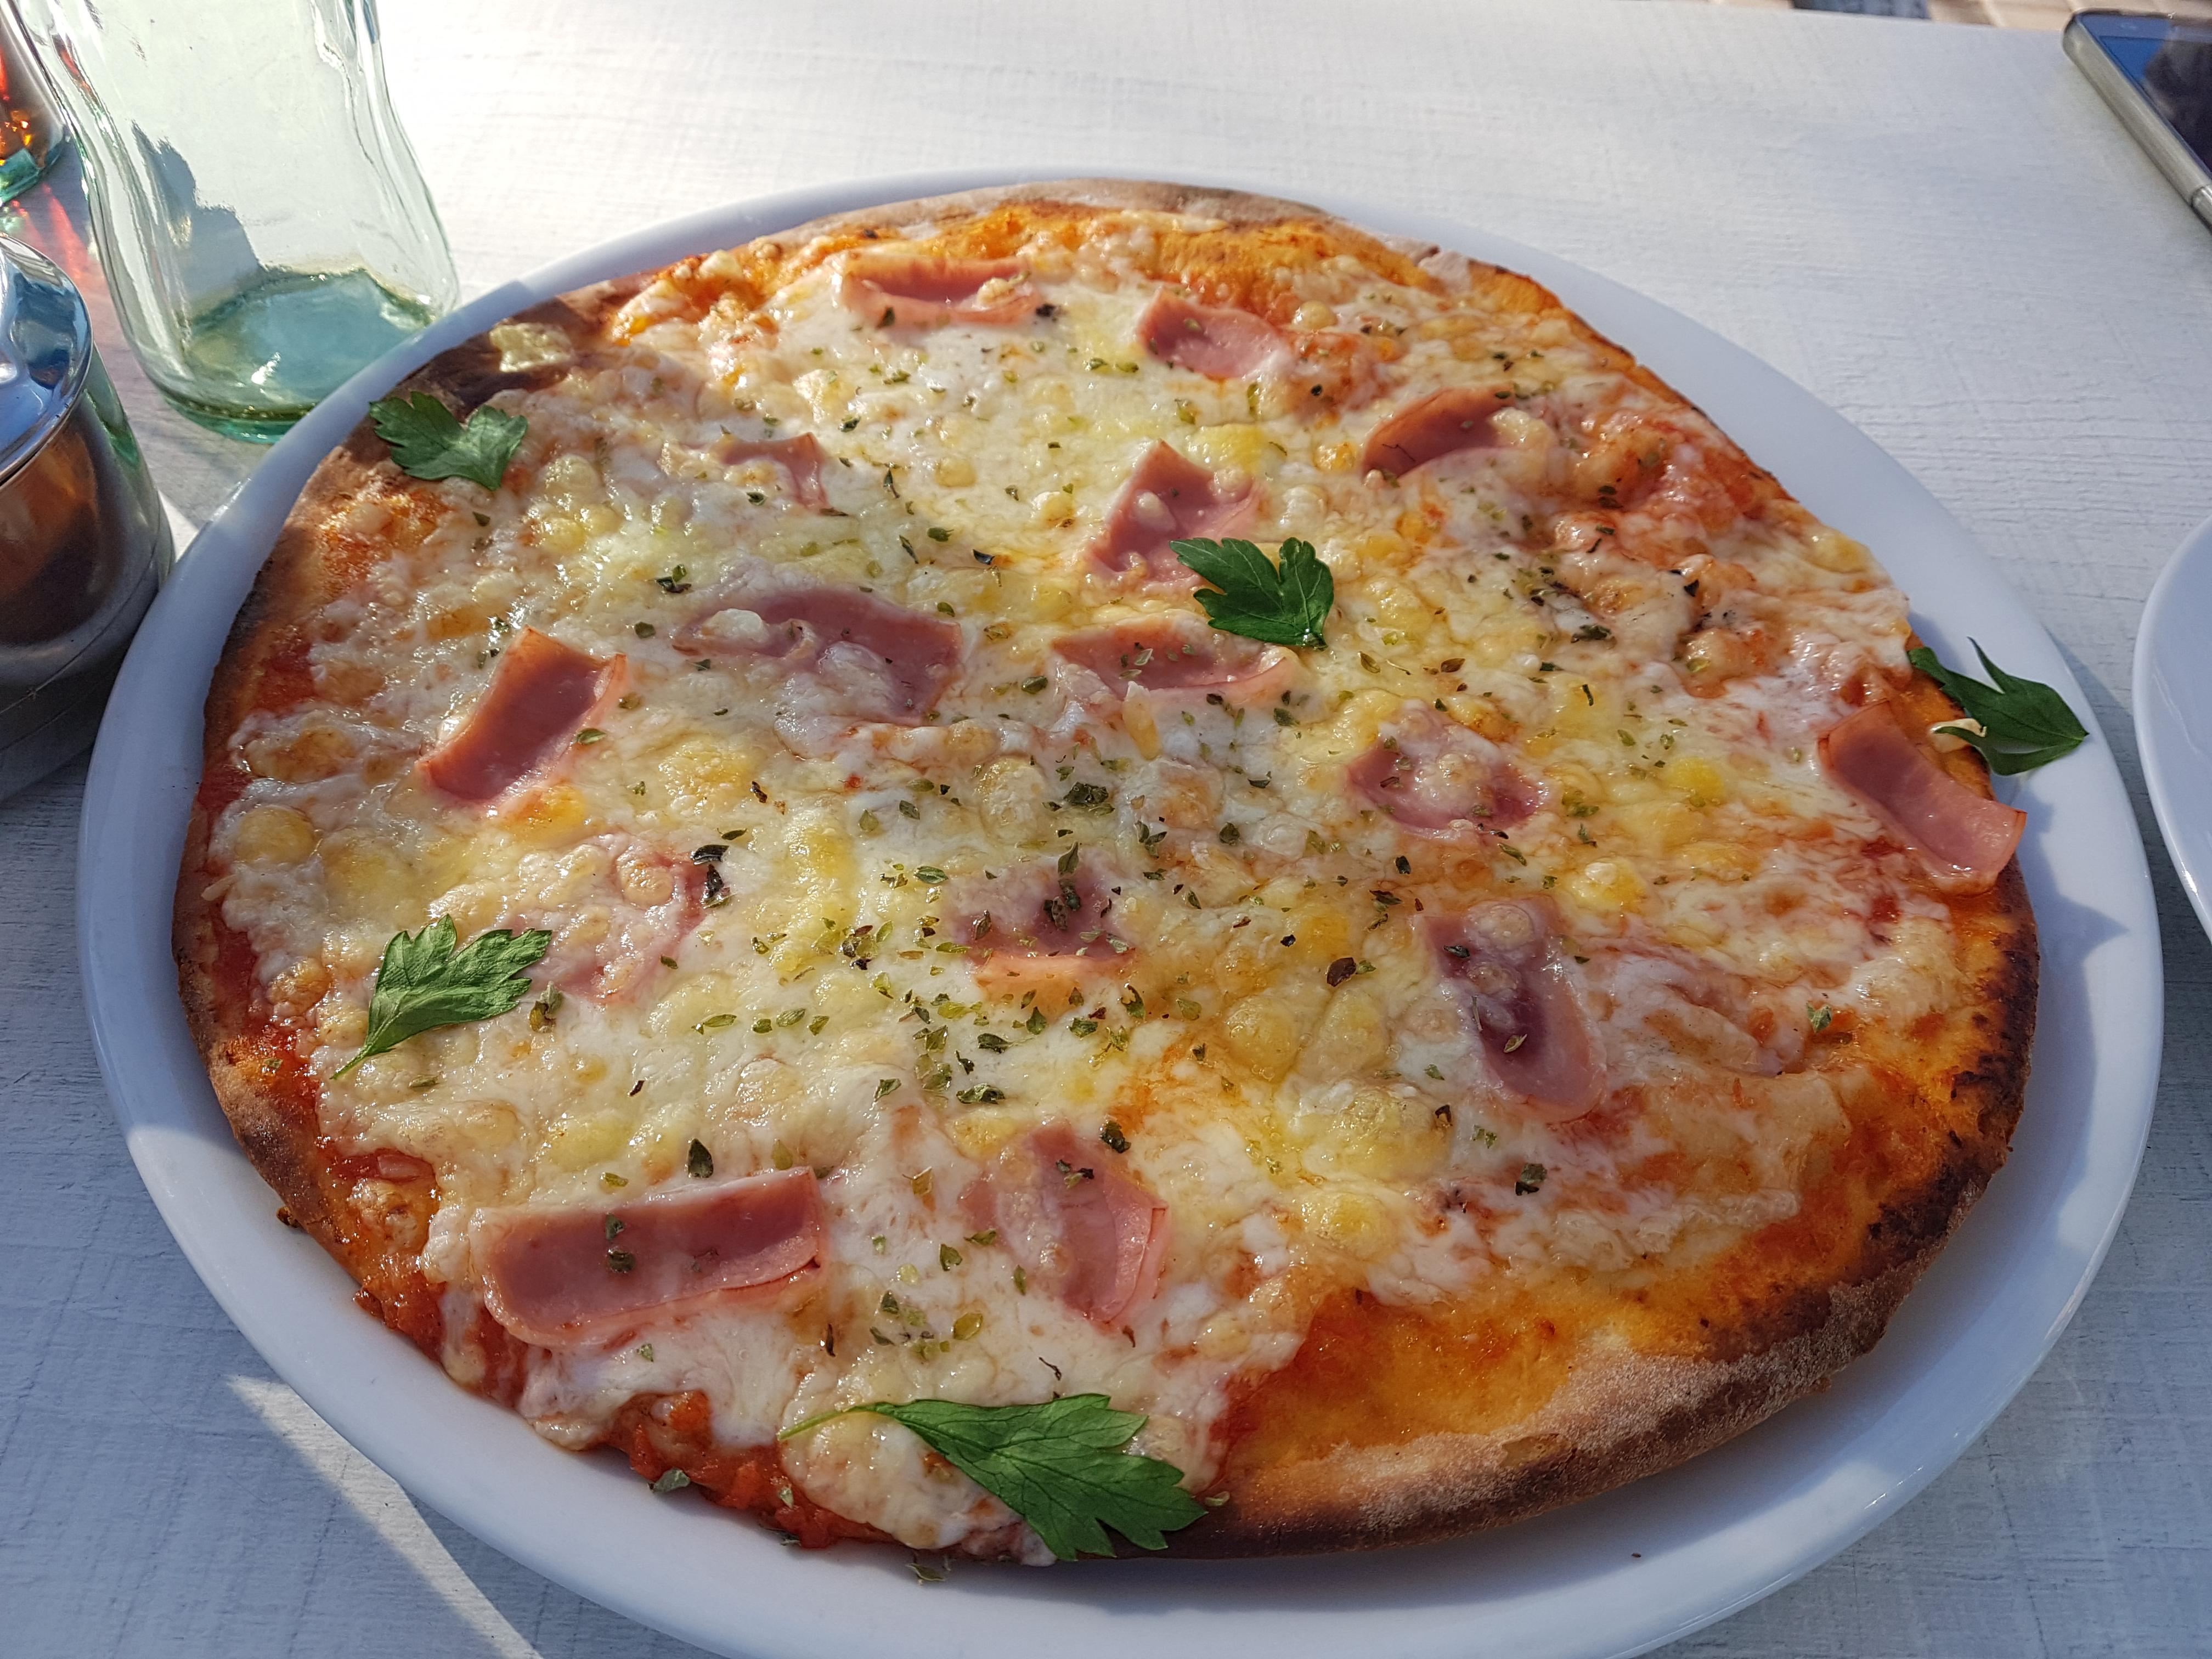 http://foodloader.net/Holz_2018-01-01_Pizza.jpg